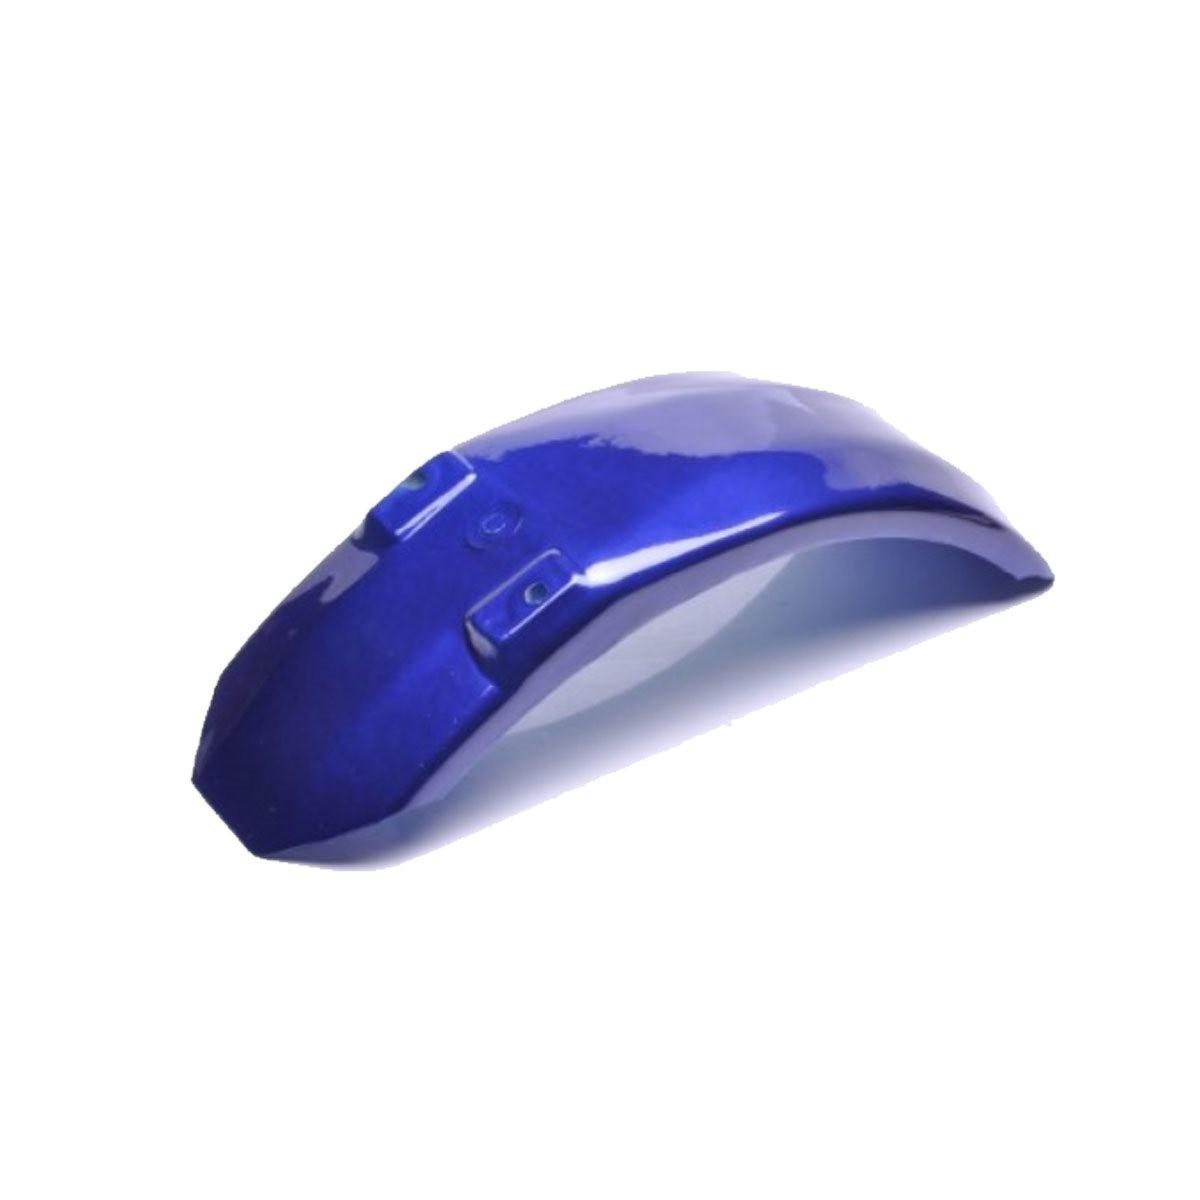 Paralama Dianteiro para Walk Machine - Azul